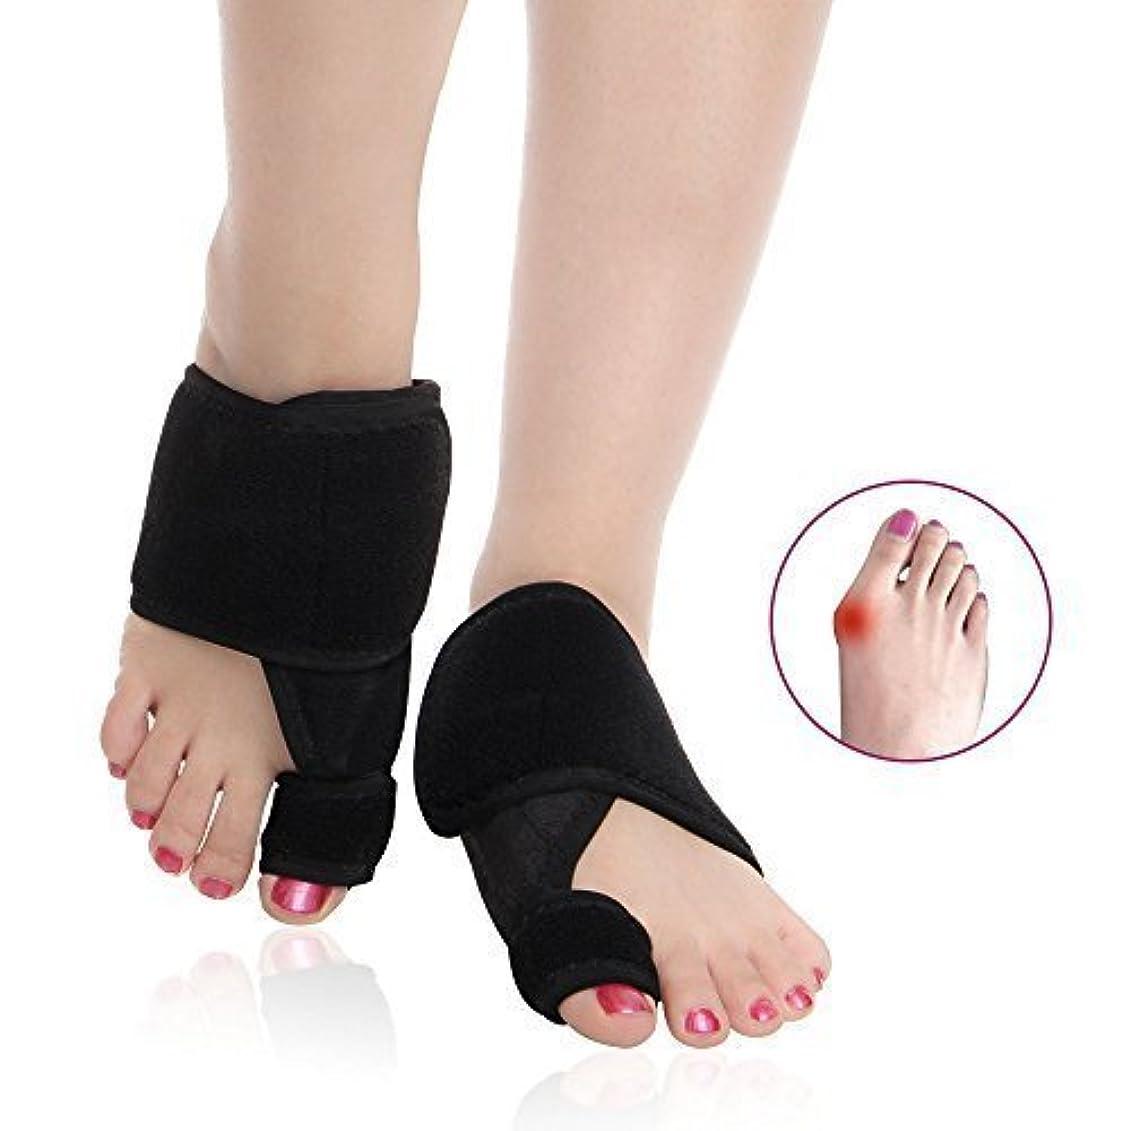 [Toe Glow] 外反母趾 サポーター 足 親指 矯正 ベルト 黒 フリーサイズ